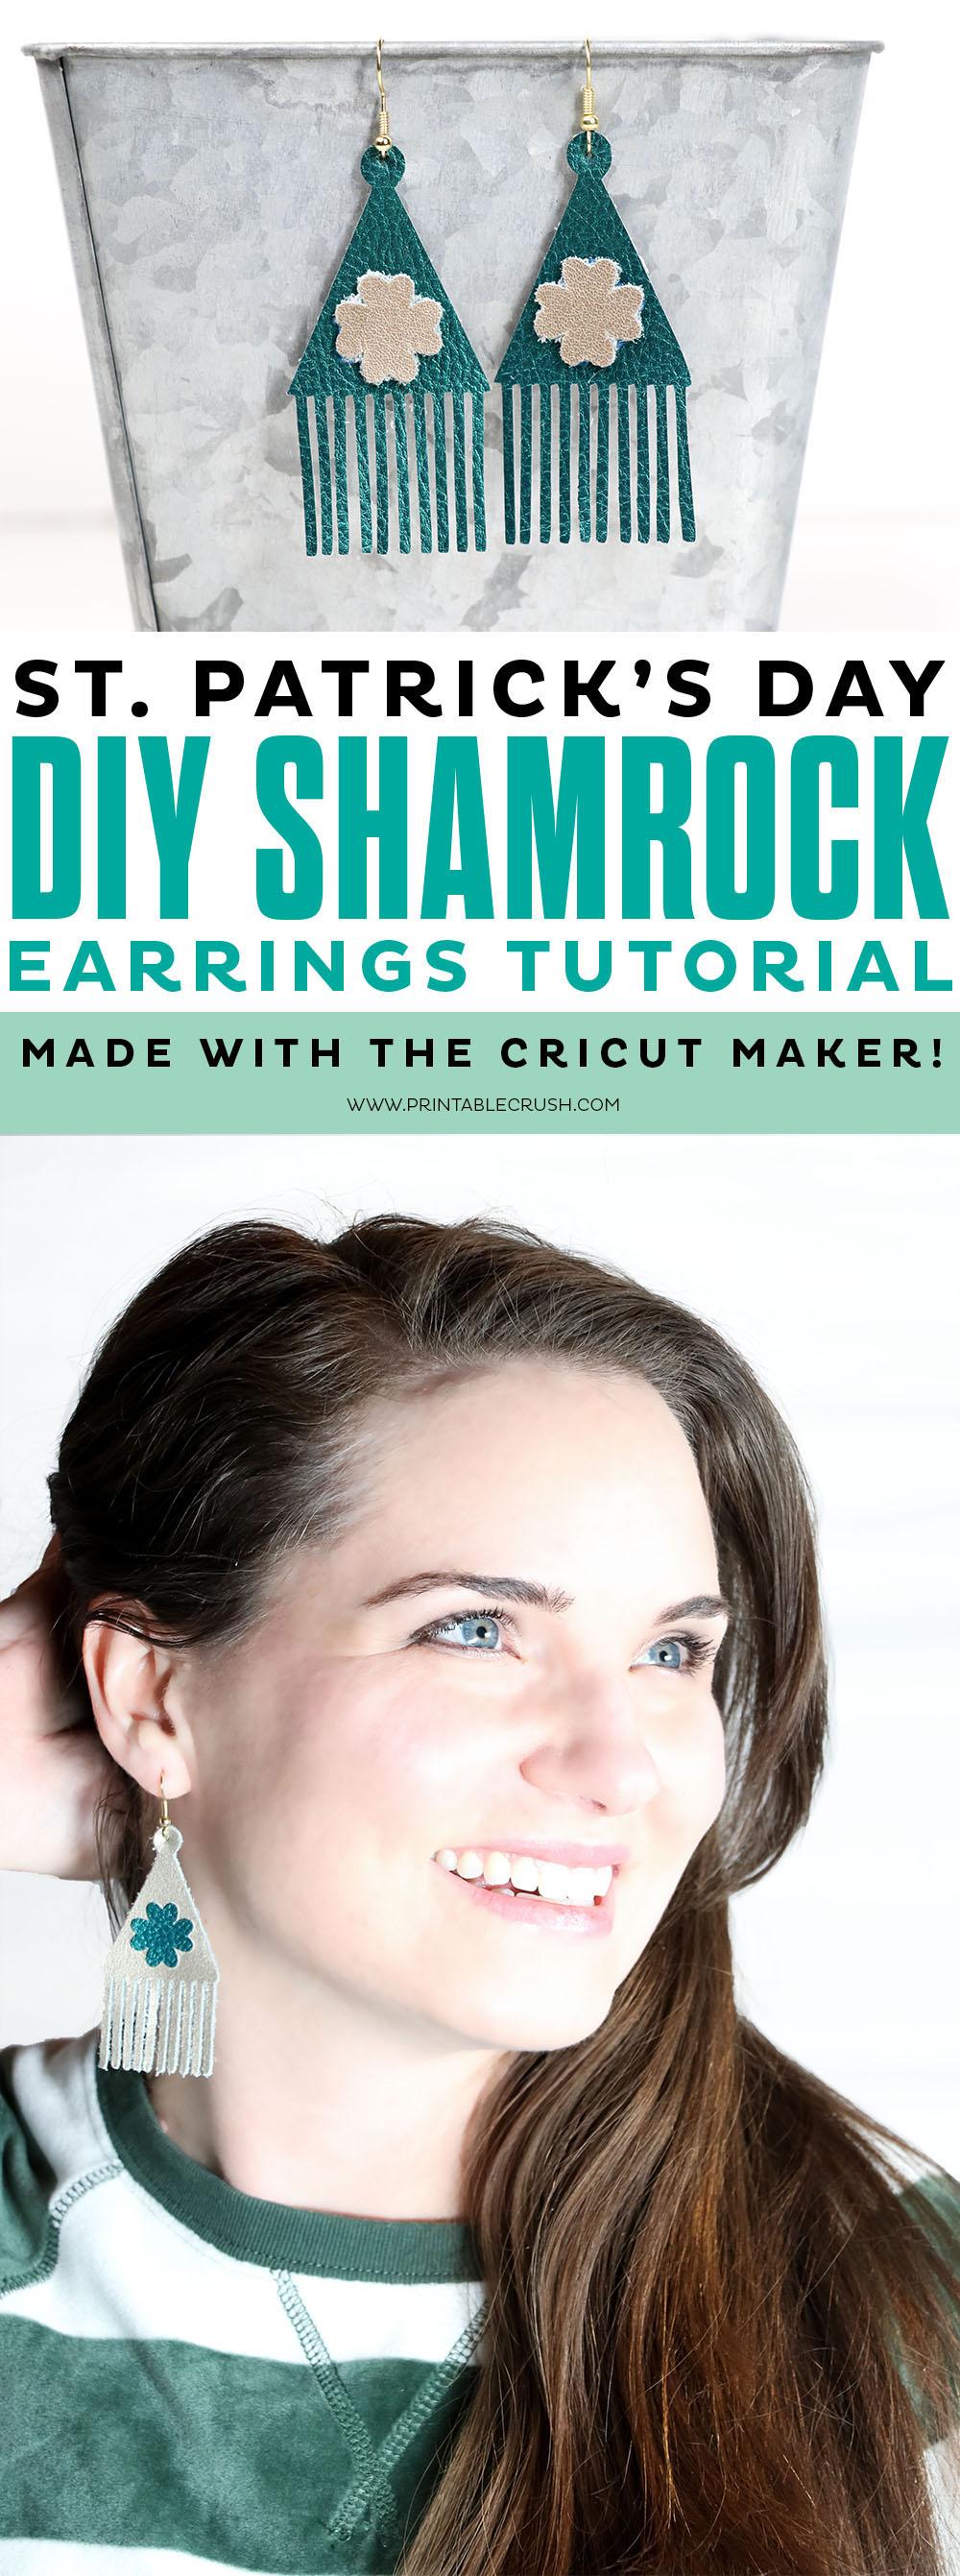 Create these pretty St. Patrick's Day Shamrock Earrings for with the Cricut Maker! #stpatricksday #cricutmade #cricutmaker #sayitwithcricut #diyearrings #stpatricksdaycraft #diyjewelery via @printablecrush